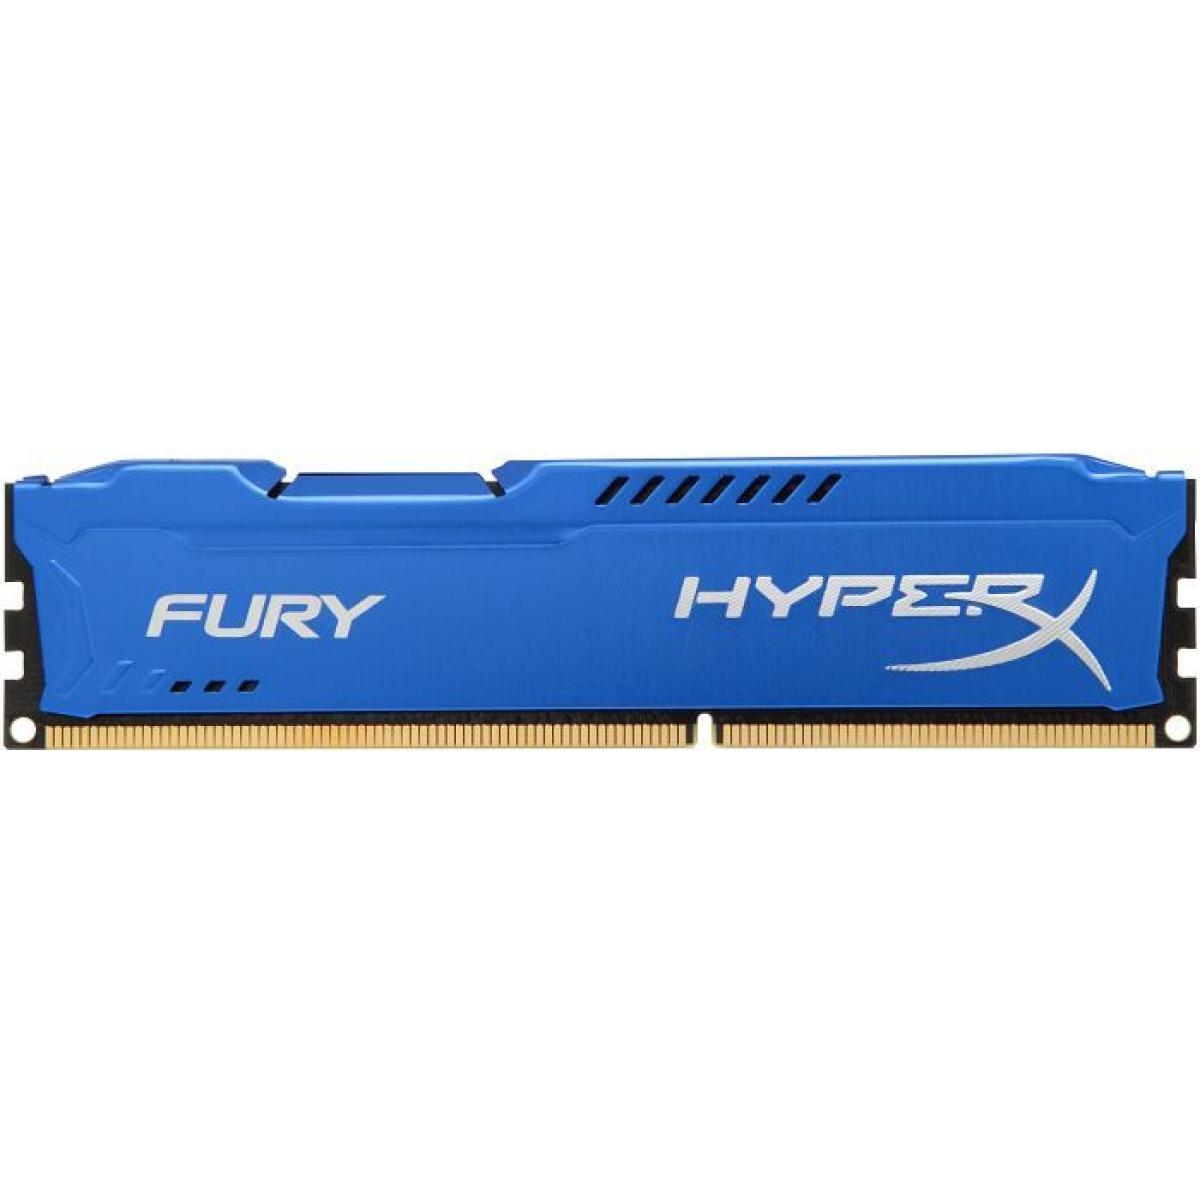 Memória DDR3 Kingston HyperX Fury, 8GB 1866MHz, Blue, HX318C10F/8